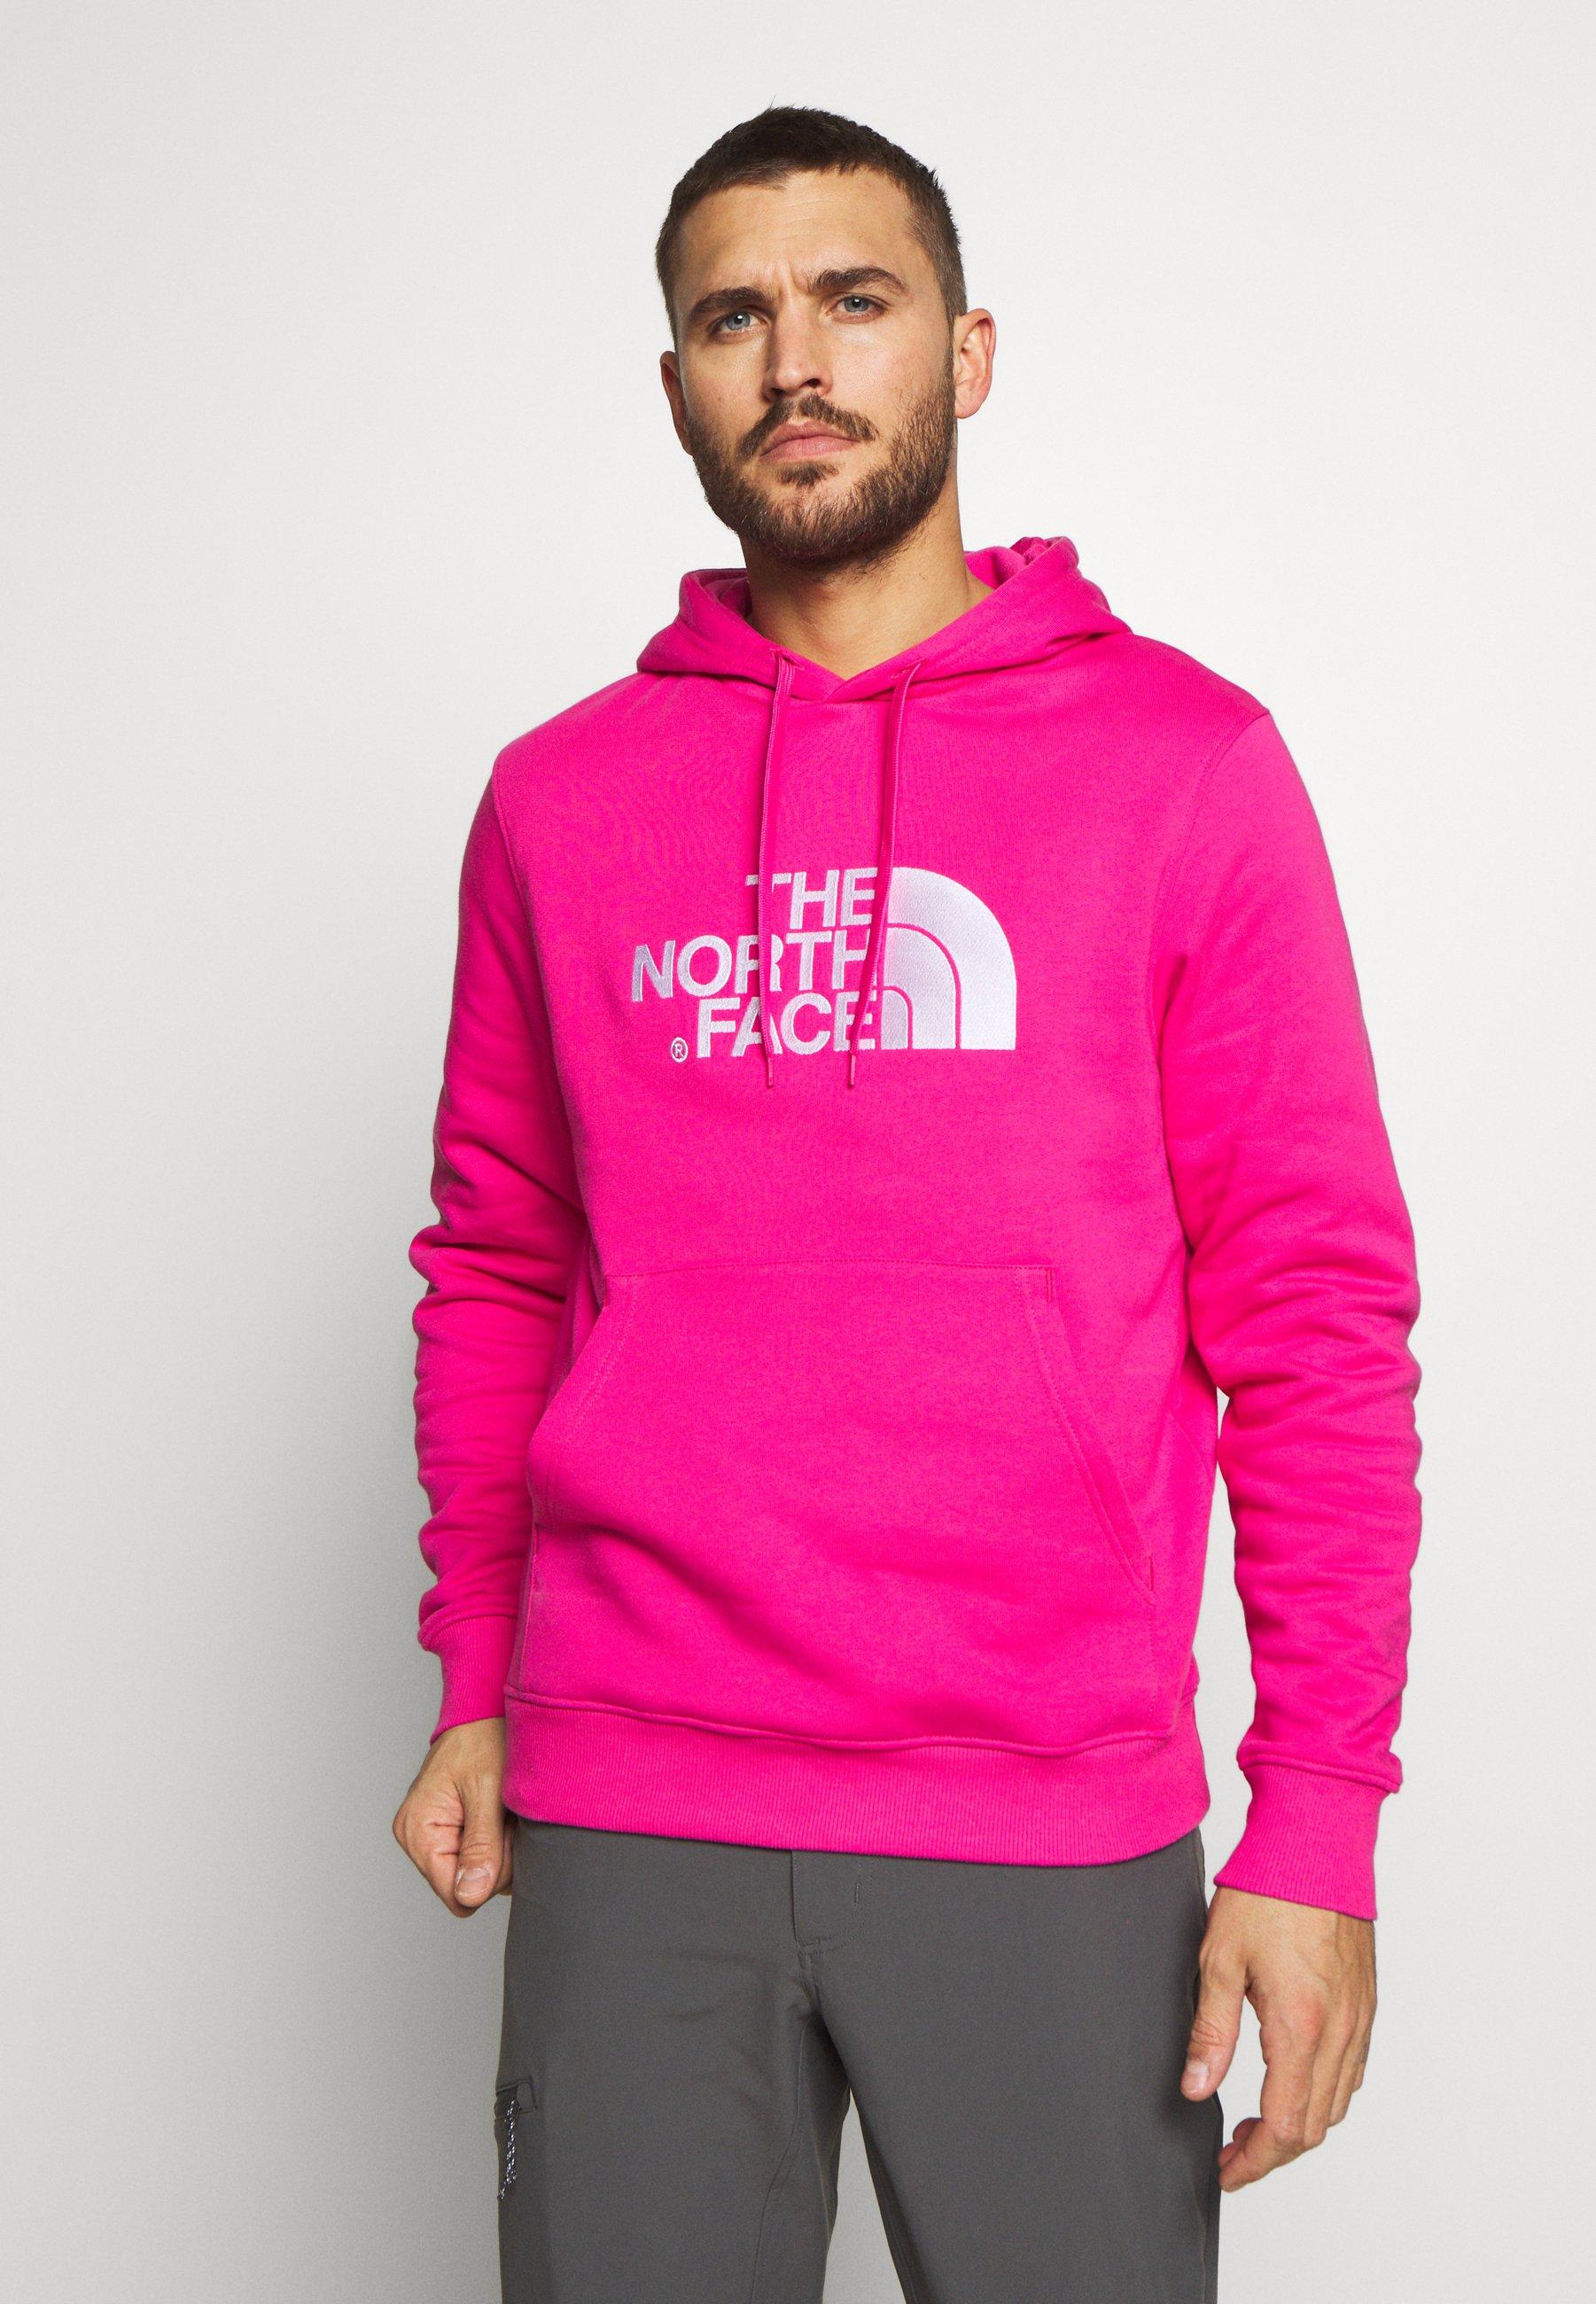 Yksinomainen Miesten vaatteet Sarja dfKJIUp97454sfGHYHD The North Face MENS DREW PEAK HOODIE Huppari mr. pink